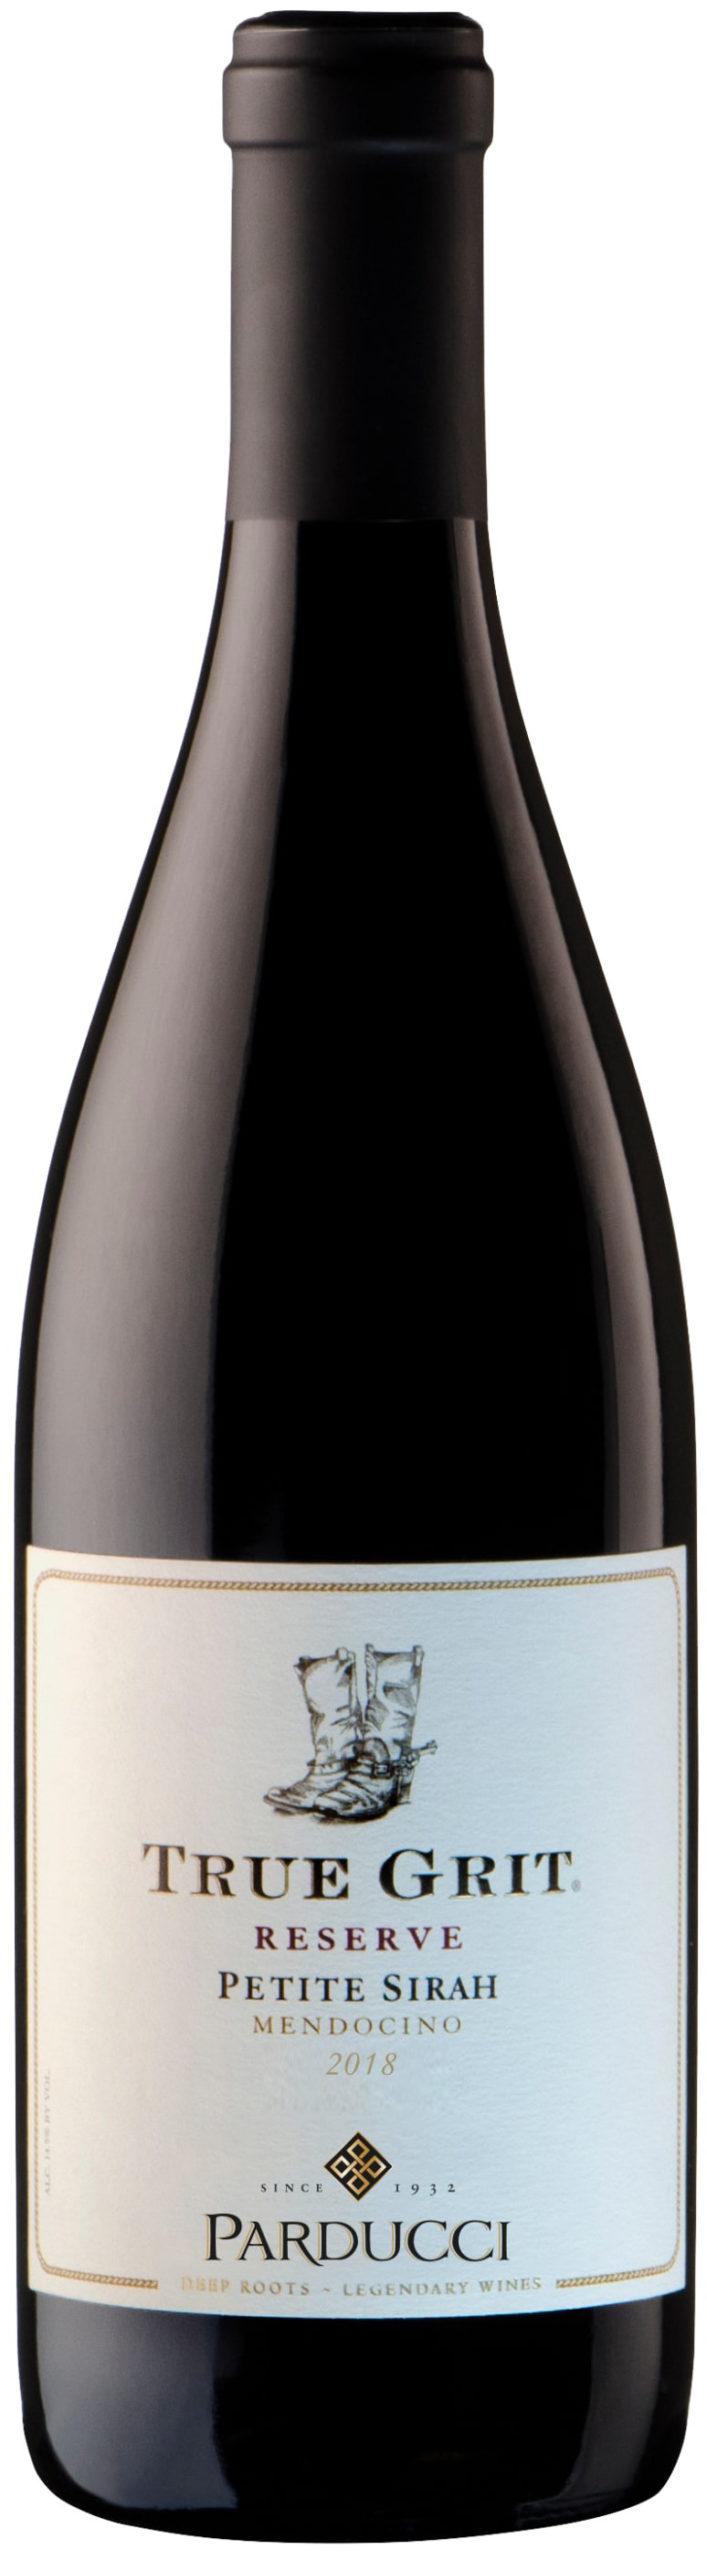 Parducci True Grit Reserve Petite Sirah 2018 red wine